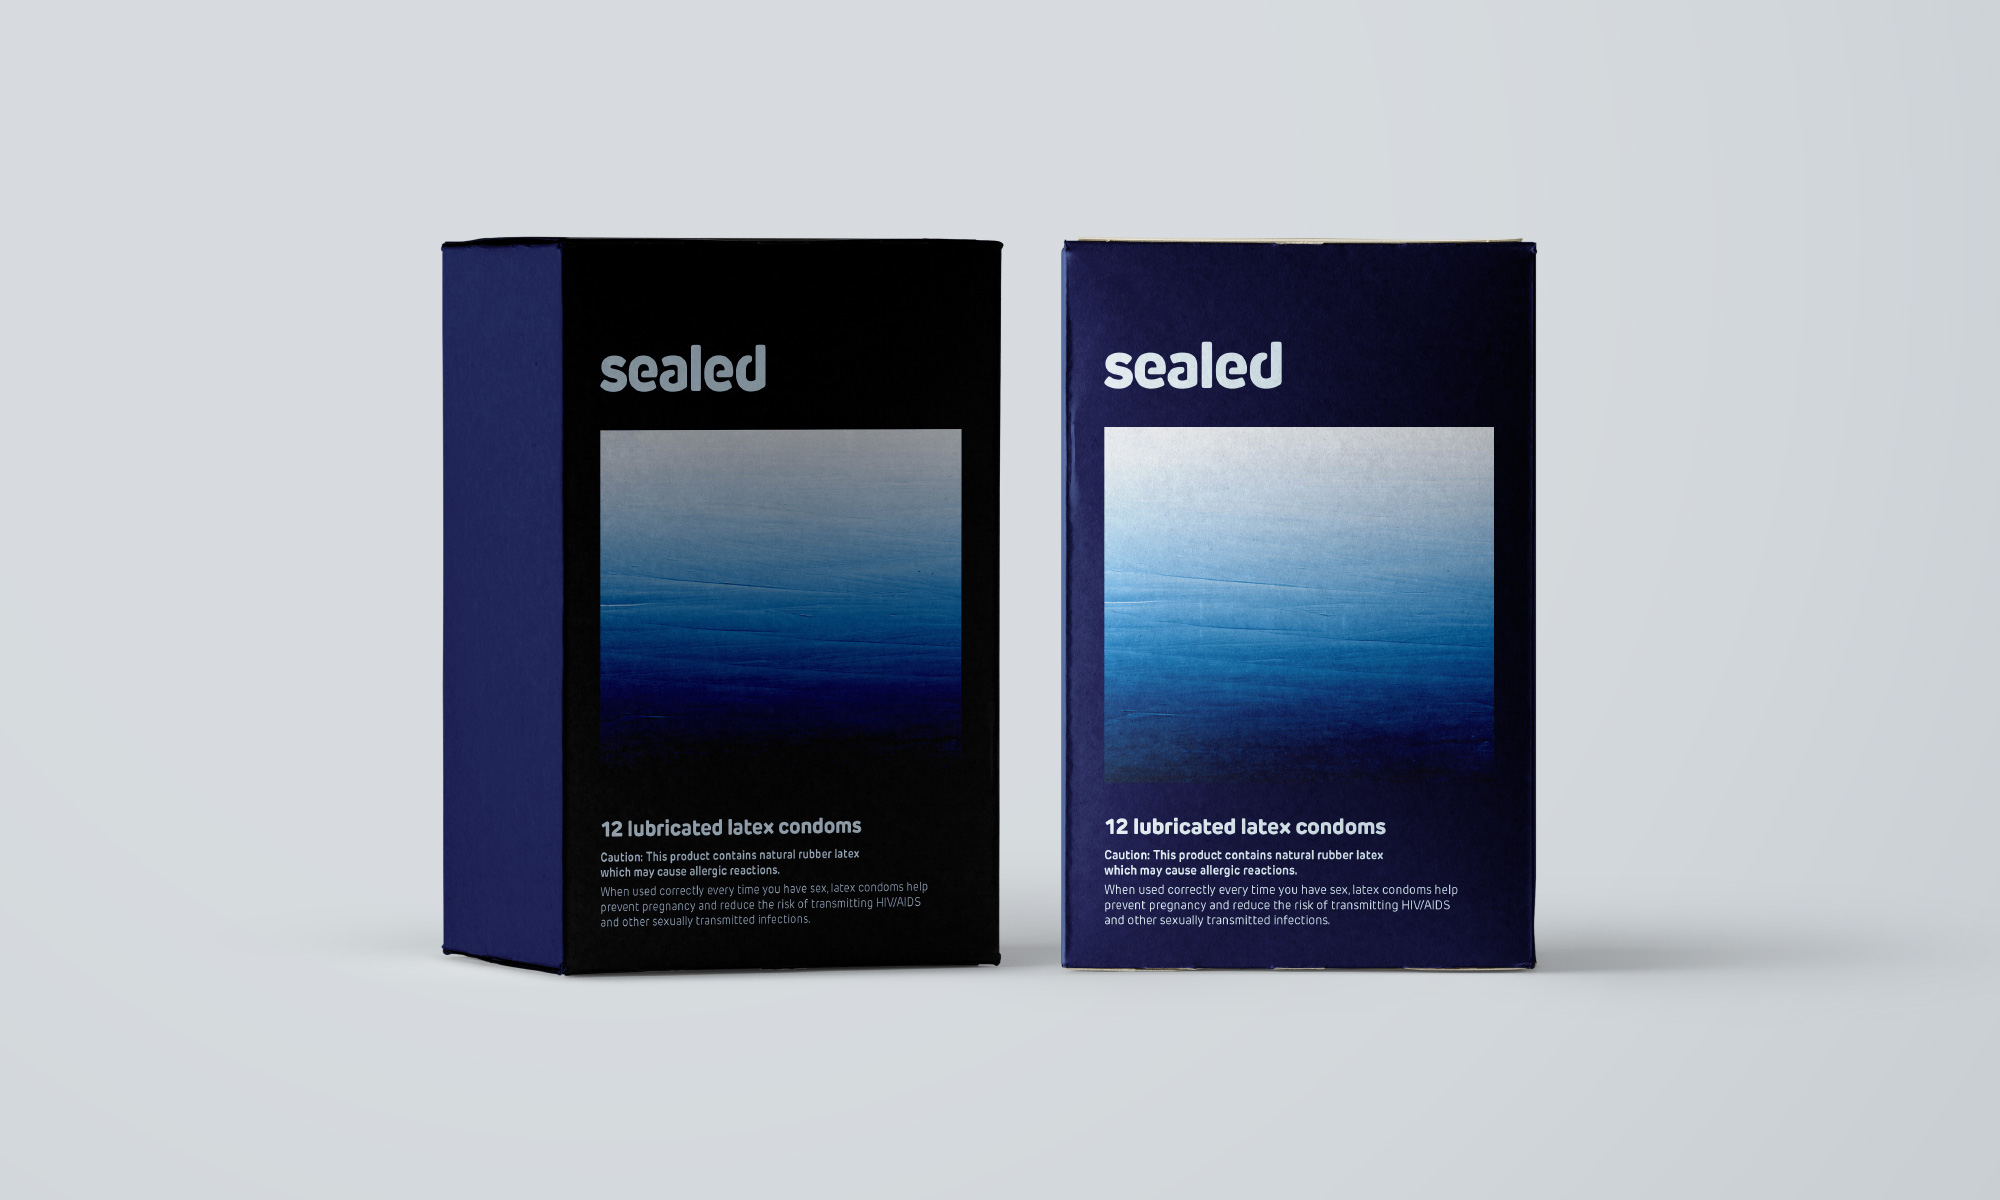 Sealed condom boxes